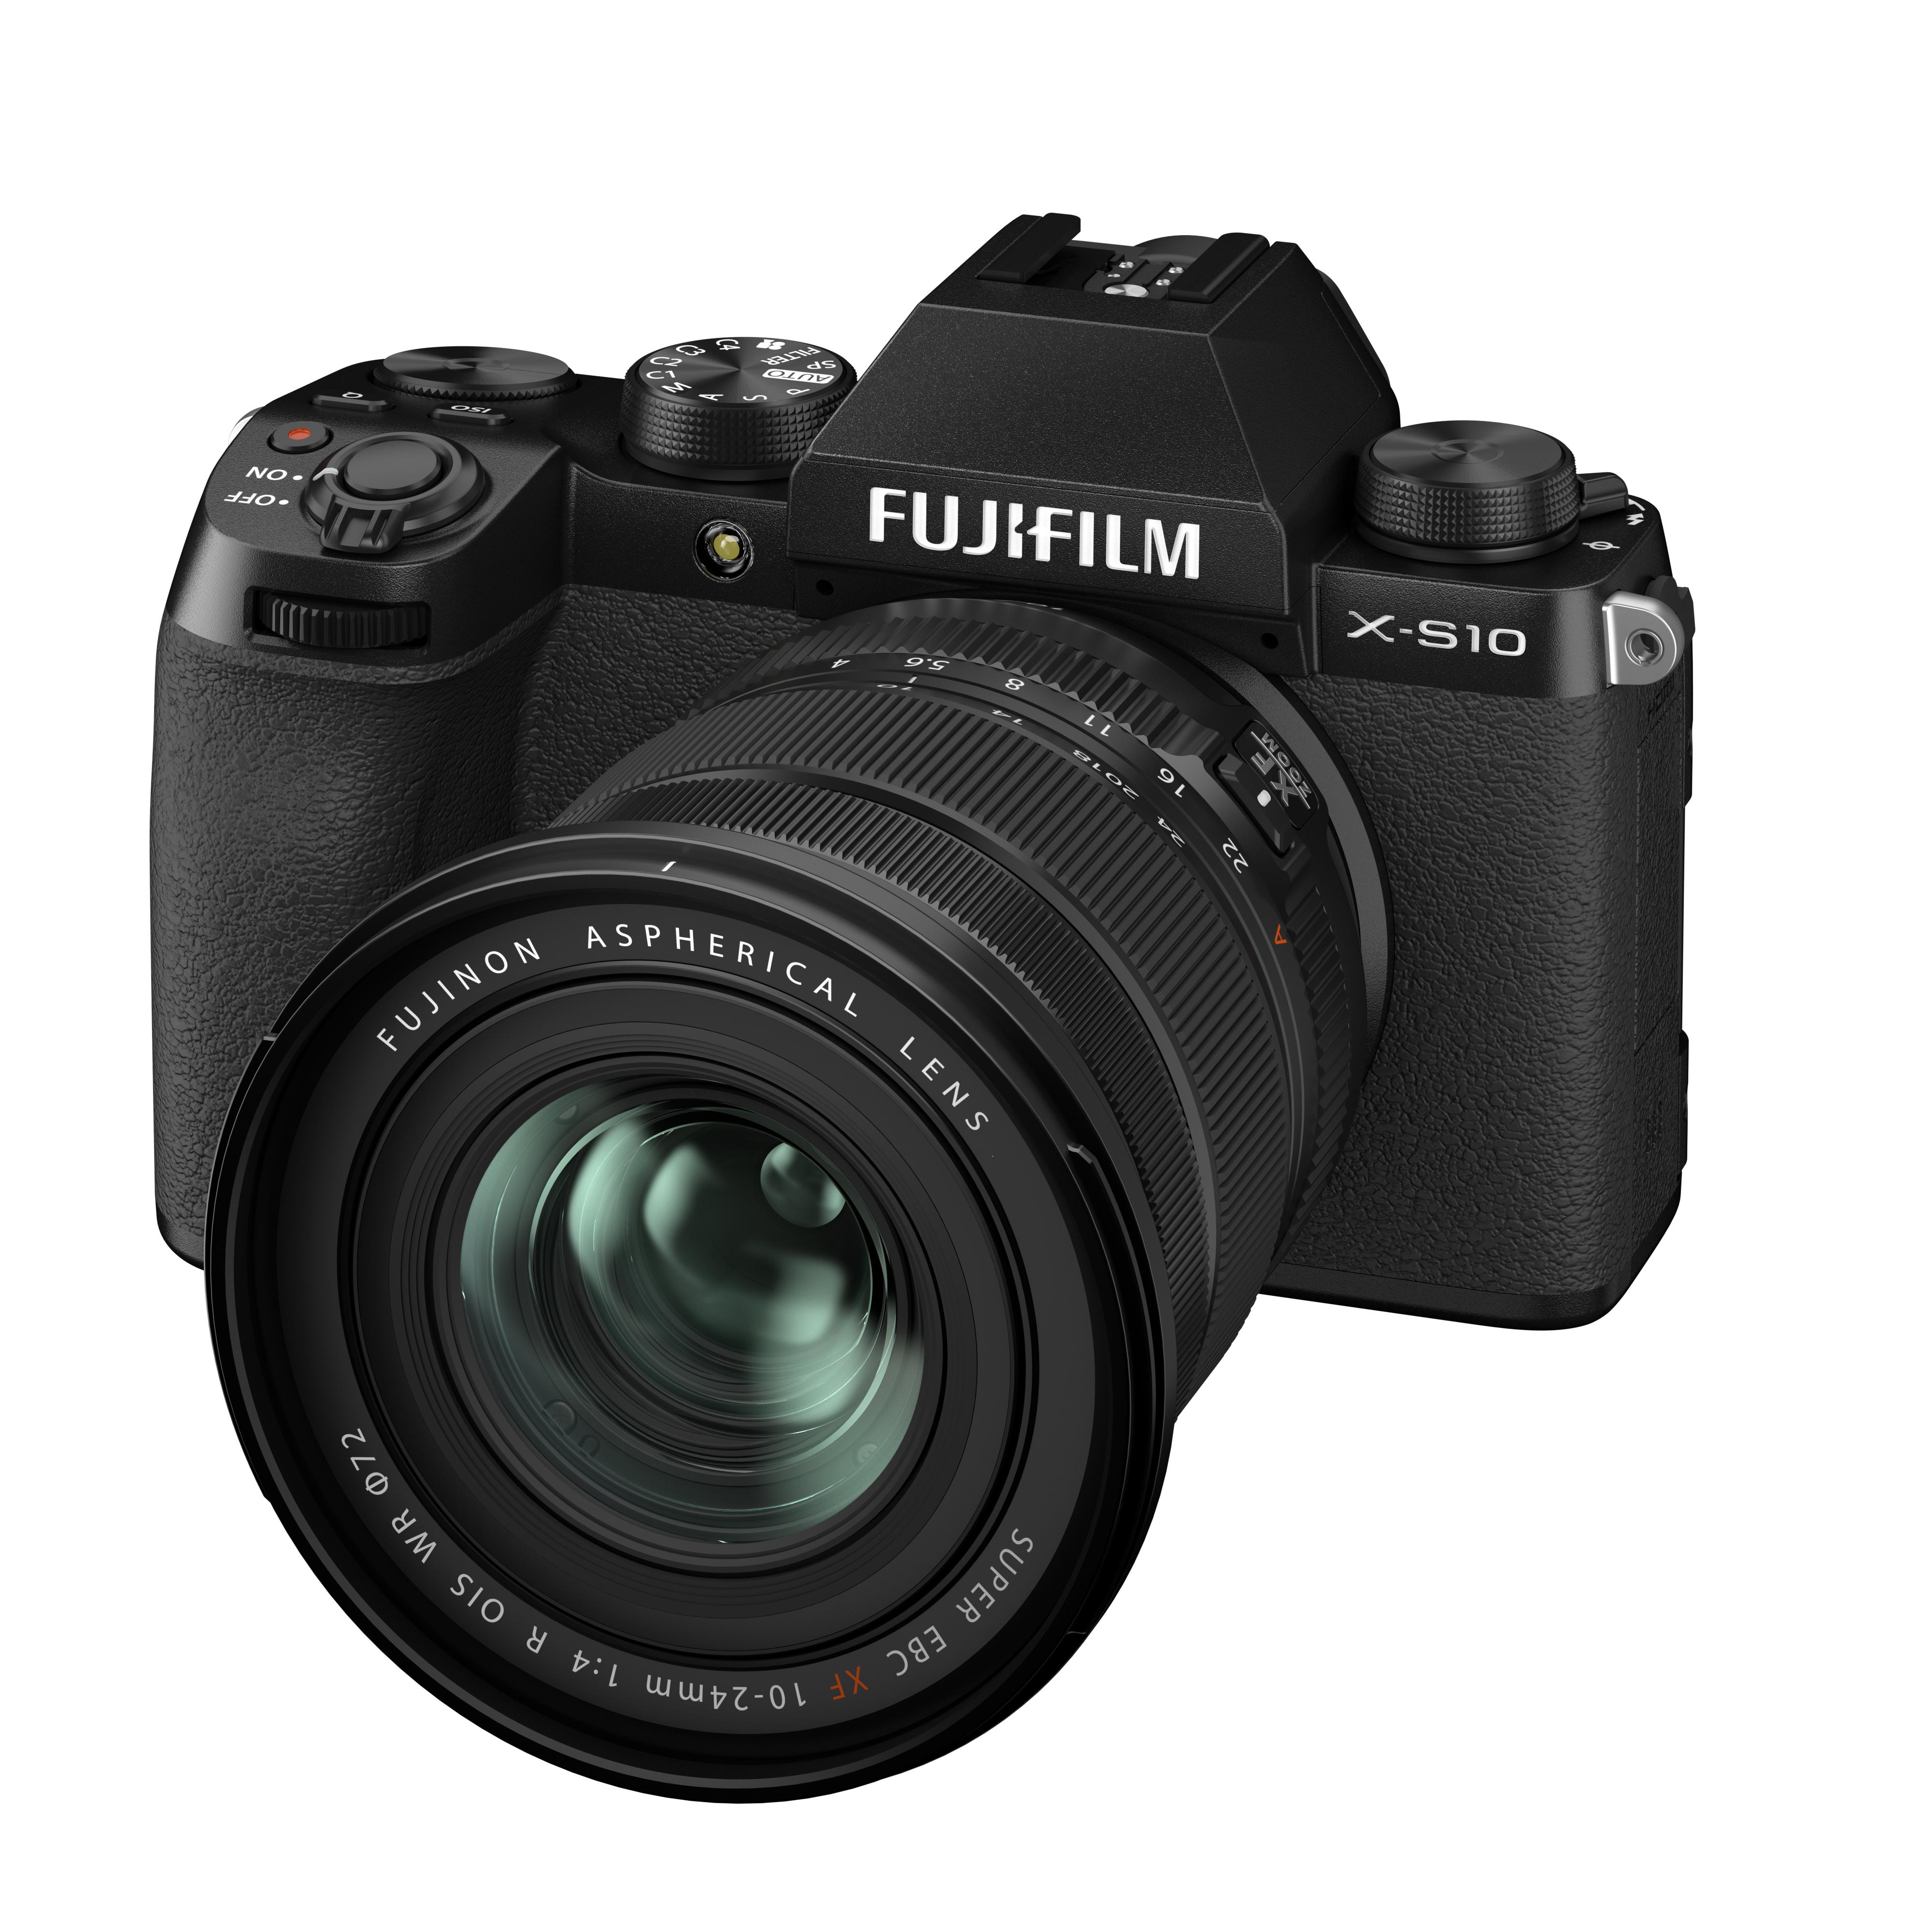 Fujifilm Introduces X-S10 Mirrorless Digital Camera 2